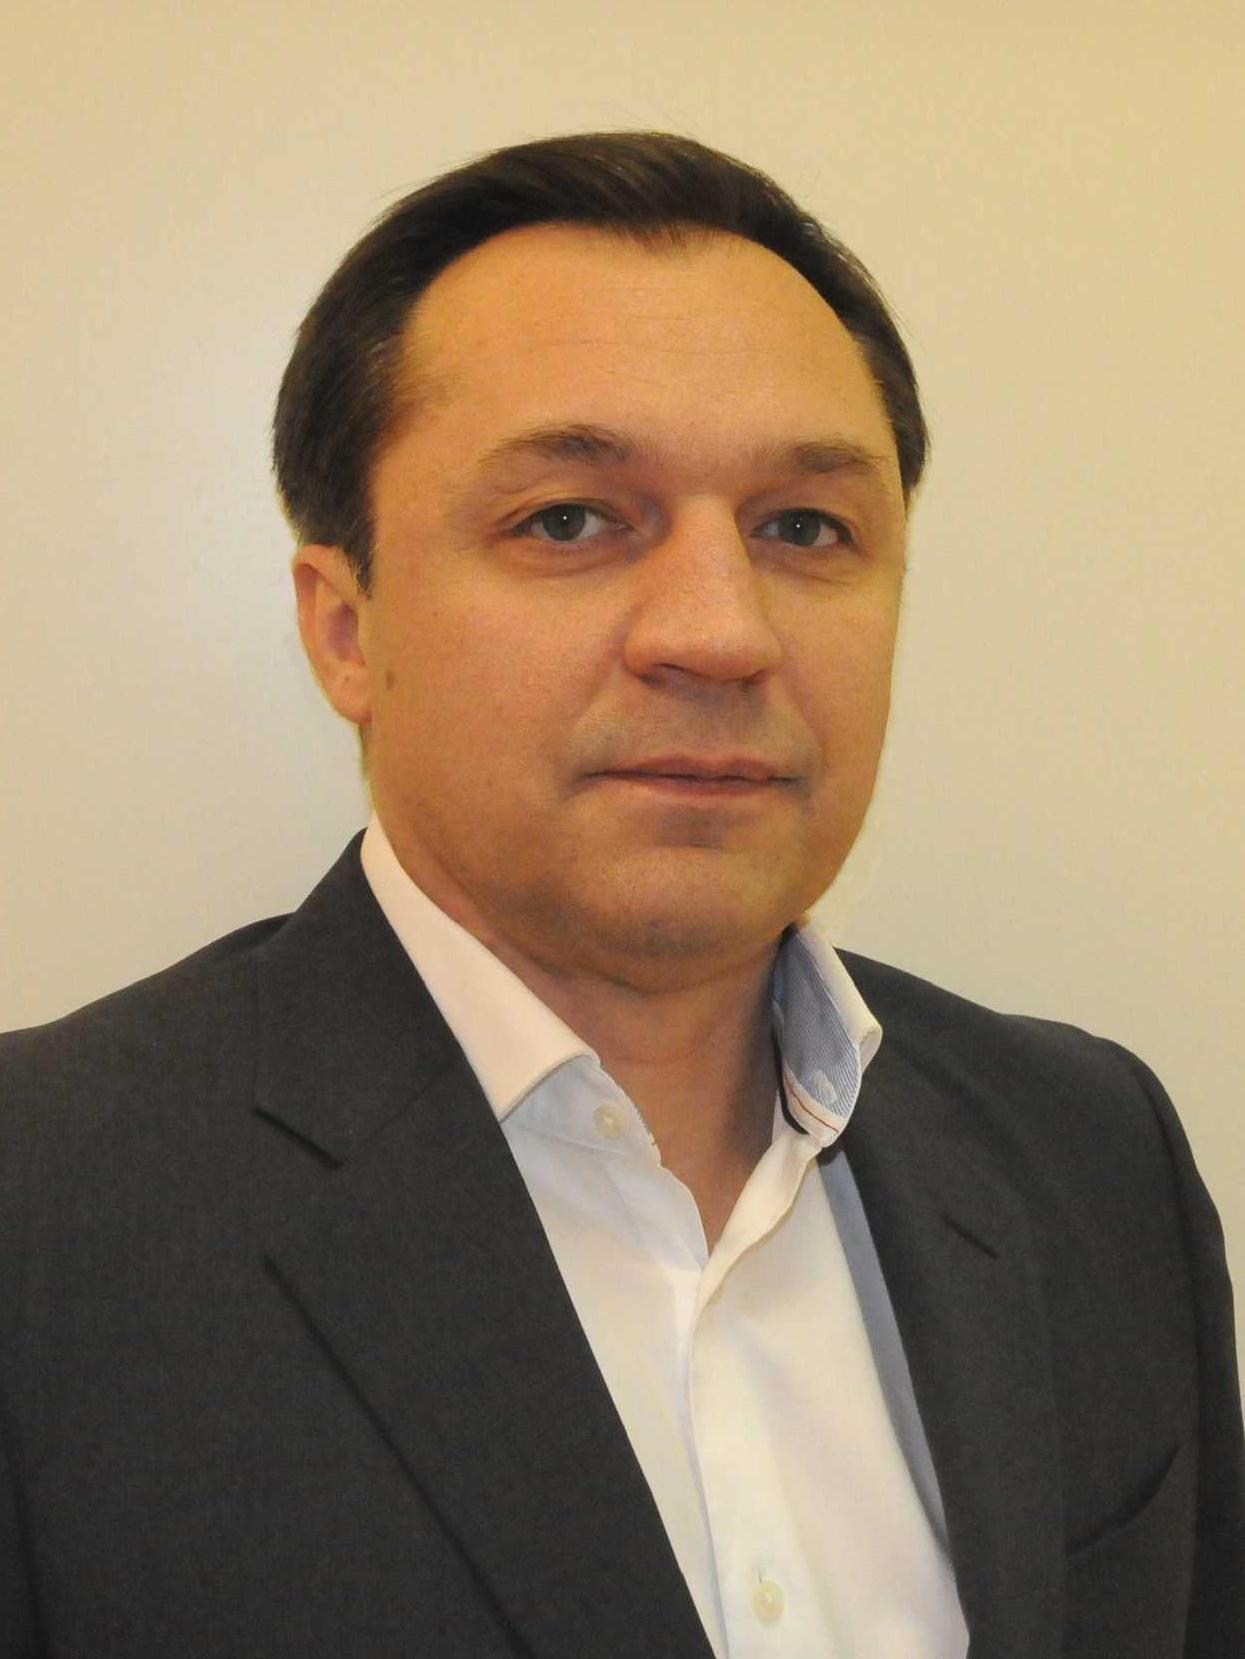 Еремин Алексей Владимирович